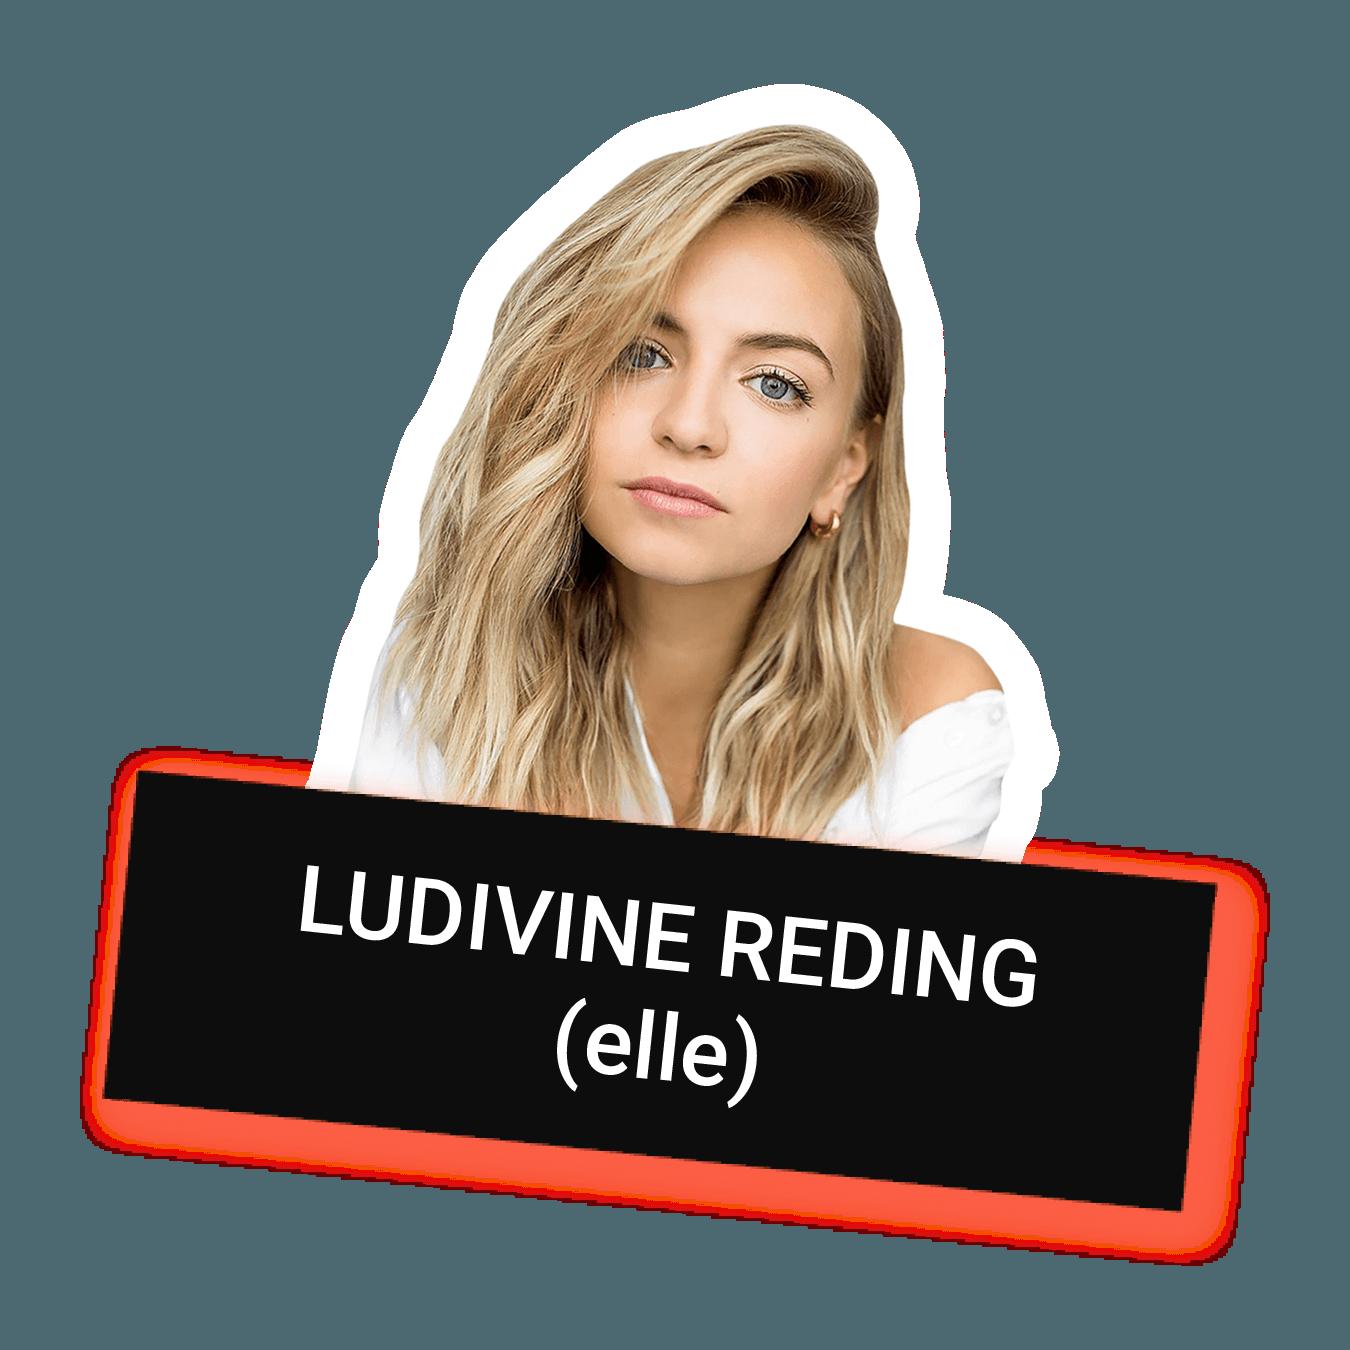 Ludivine Reding